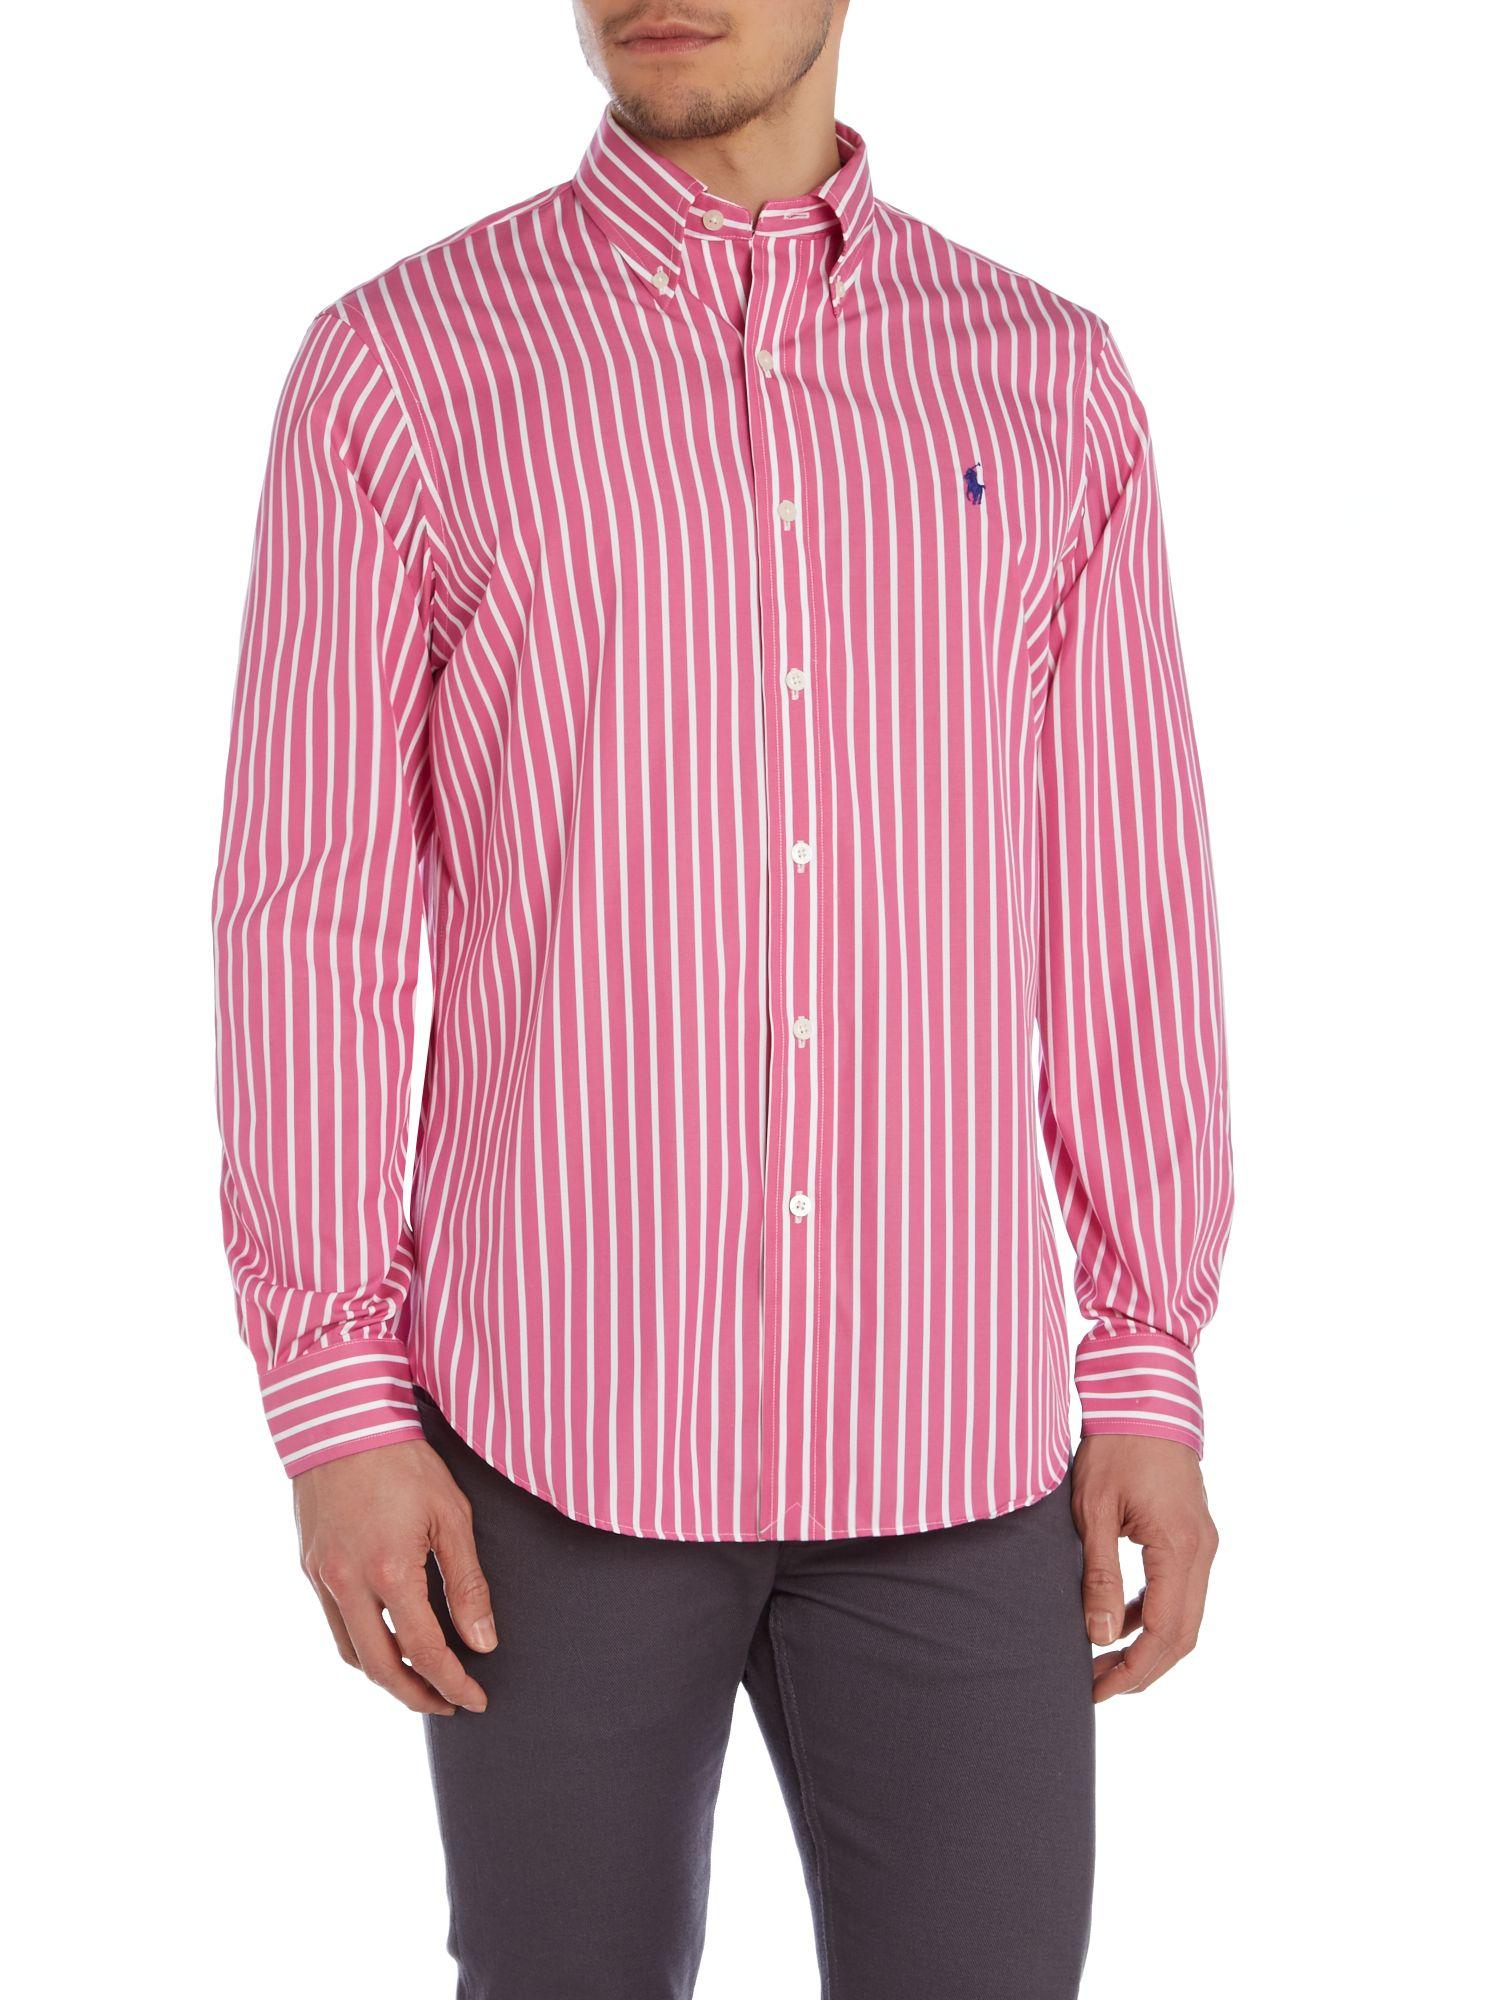 Ralph lauren golf stripe classic fit non iron polo shirt for Men s no iron dress shirts